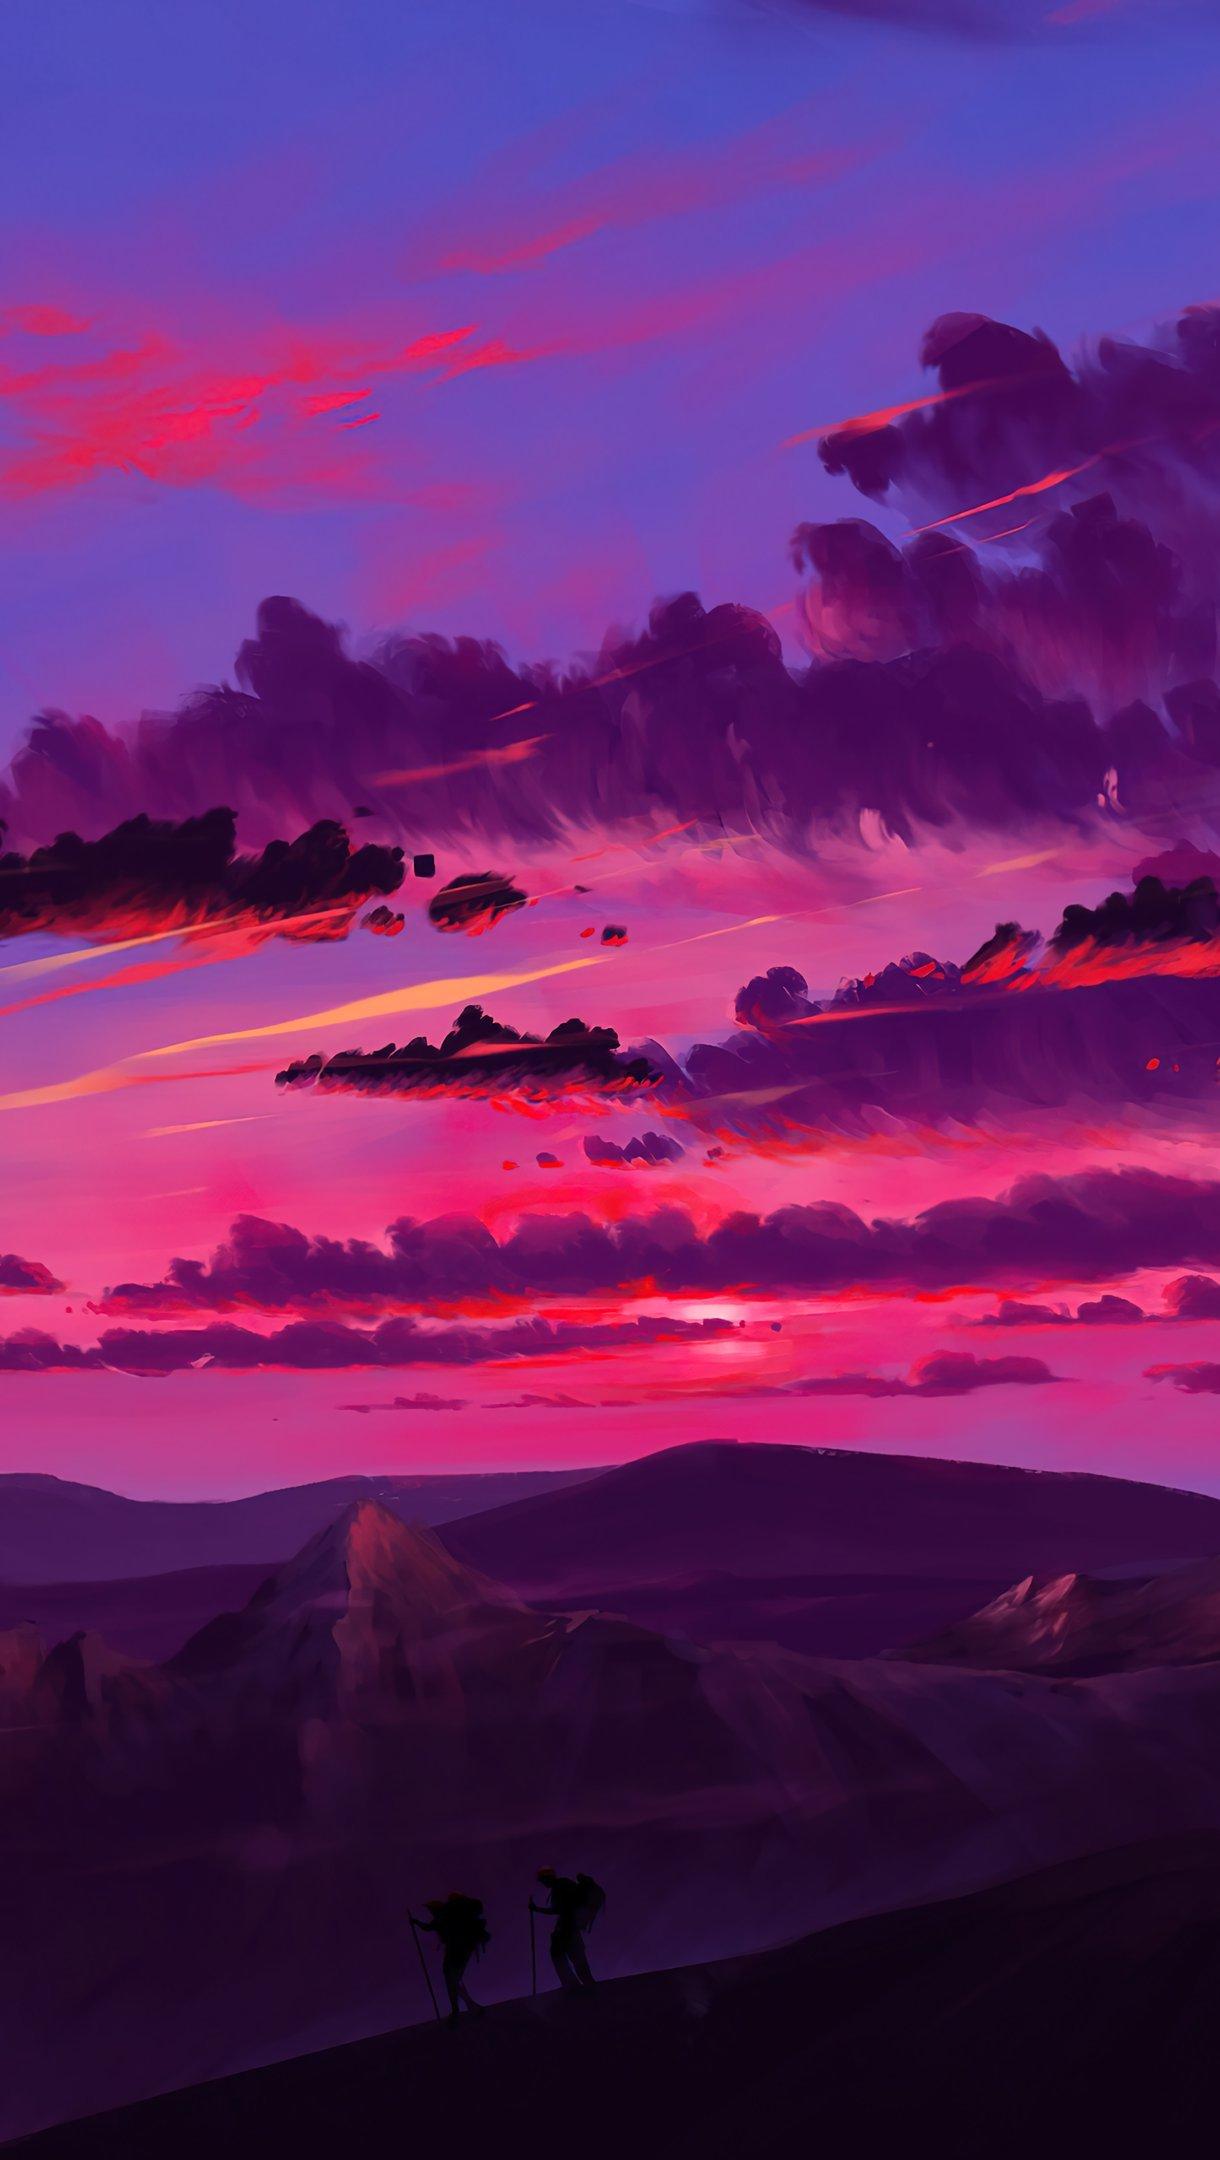 Fondos de pantalla Atardecer rosado Arte Digital Vertical